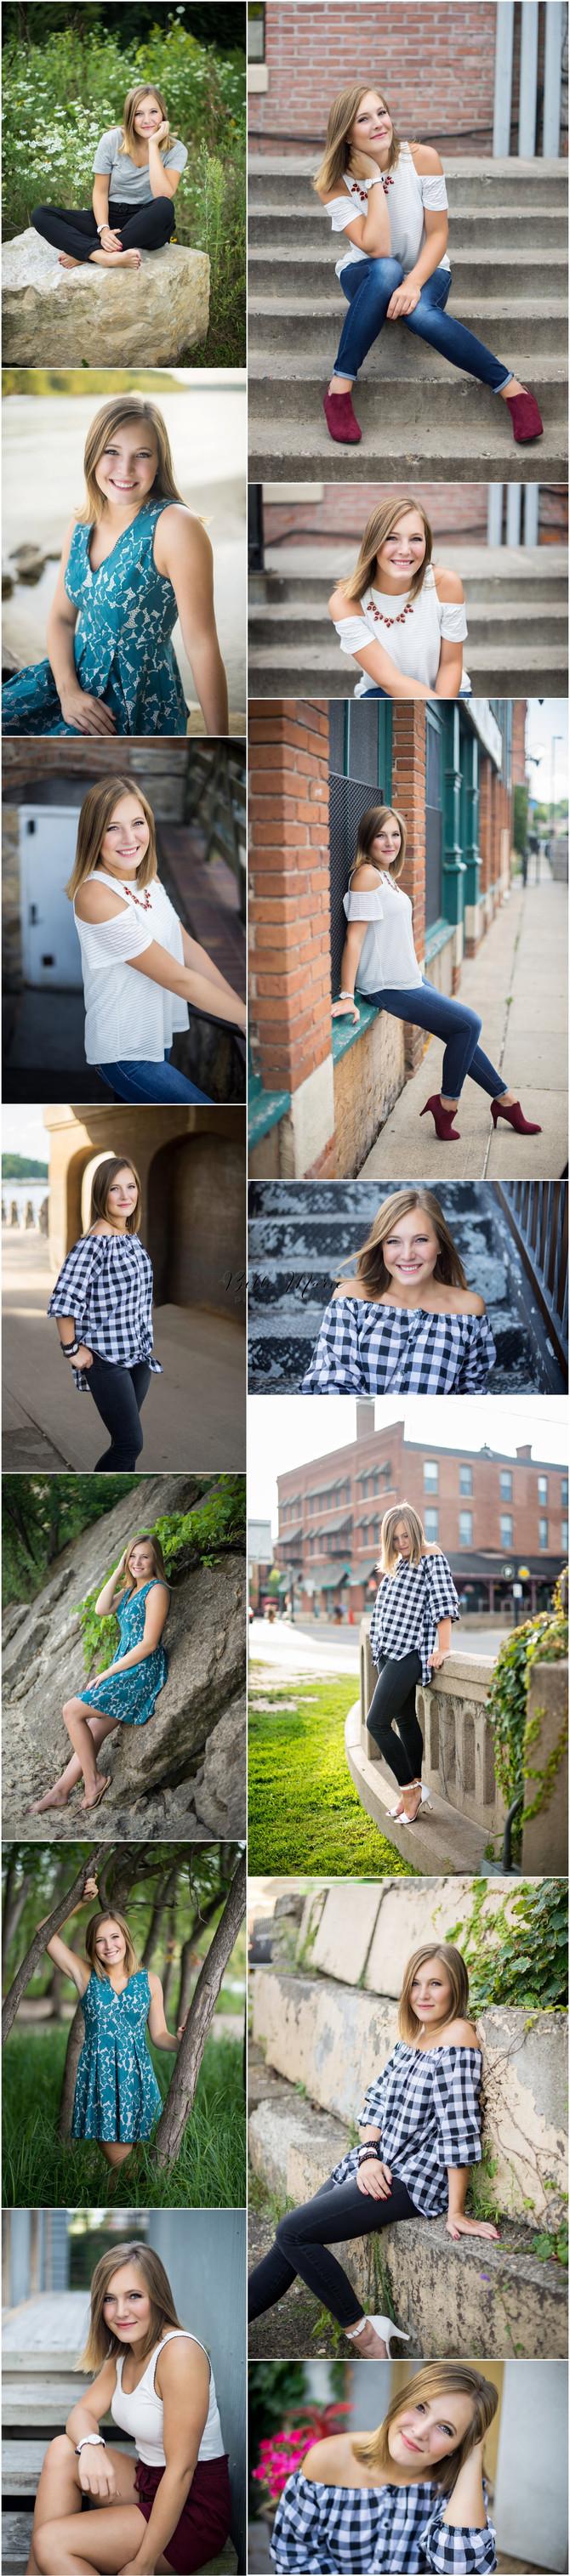 Downtown Stillwater High School Senior Portraits